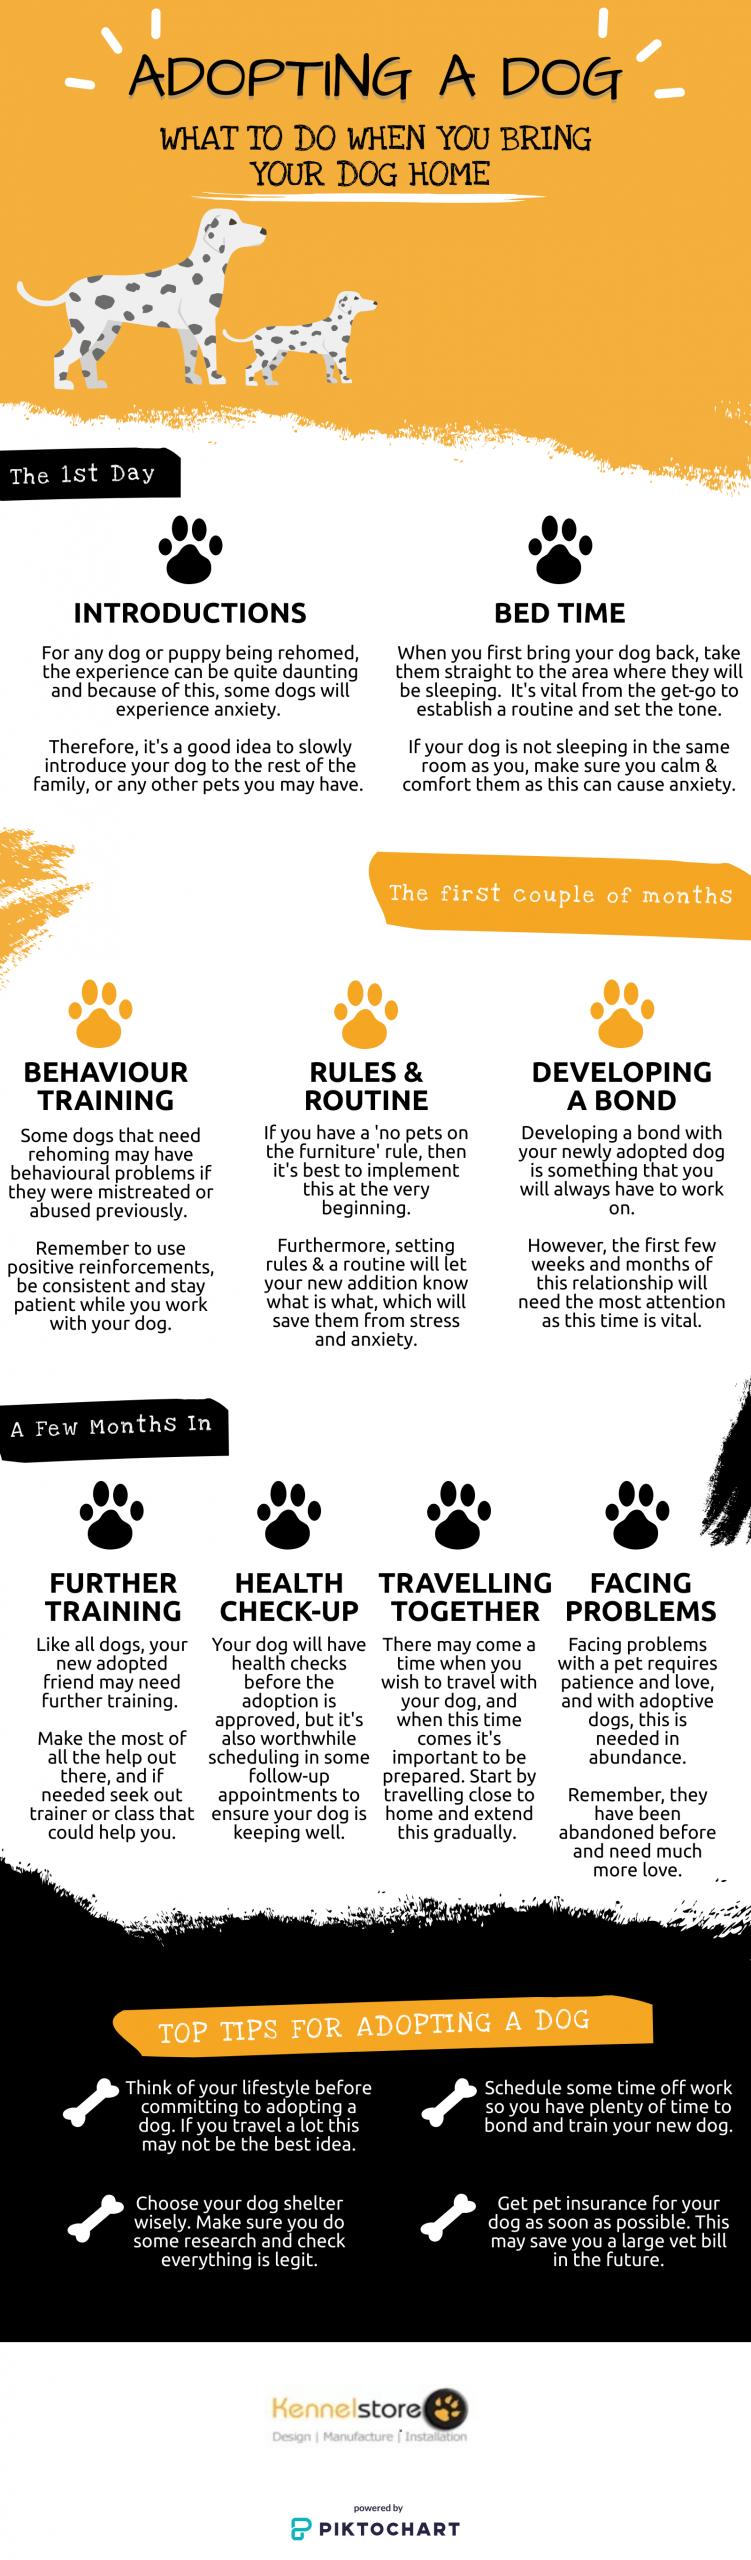 Adopting-A-Dog-Info